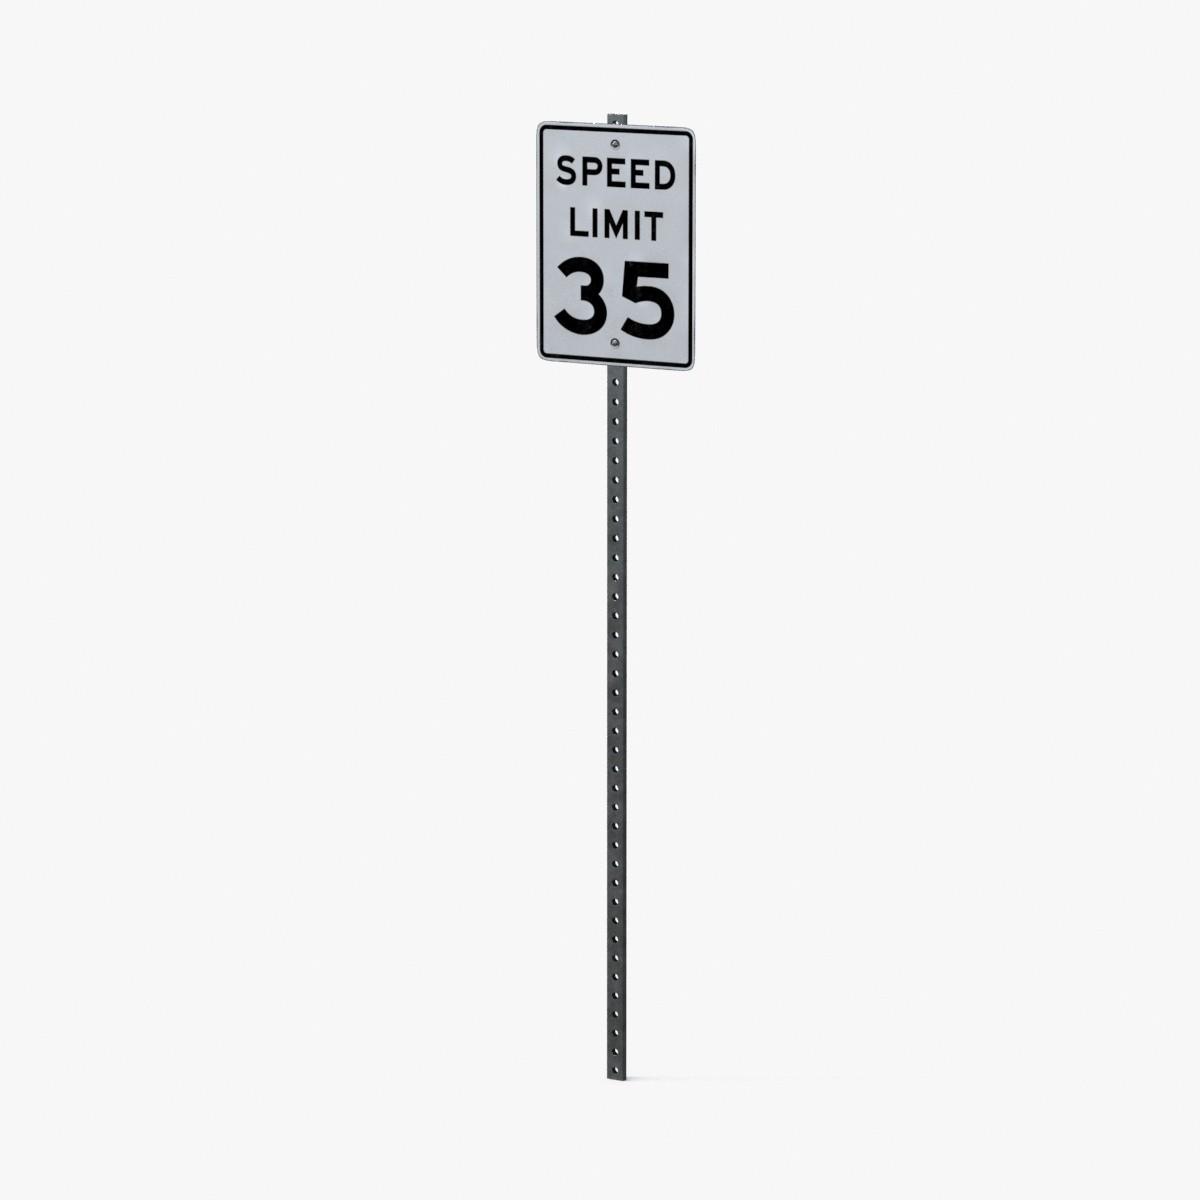 3d speed limit sign 35